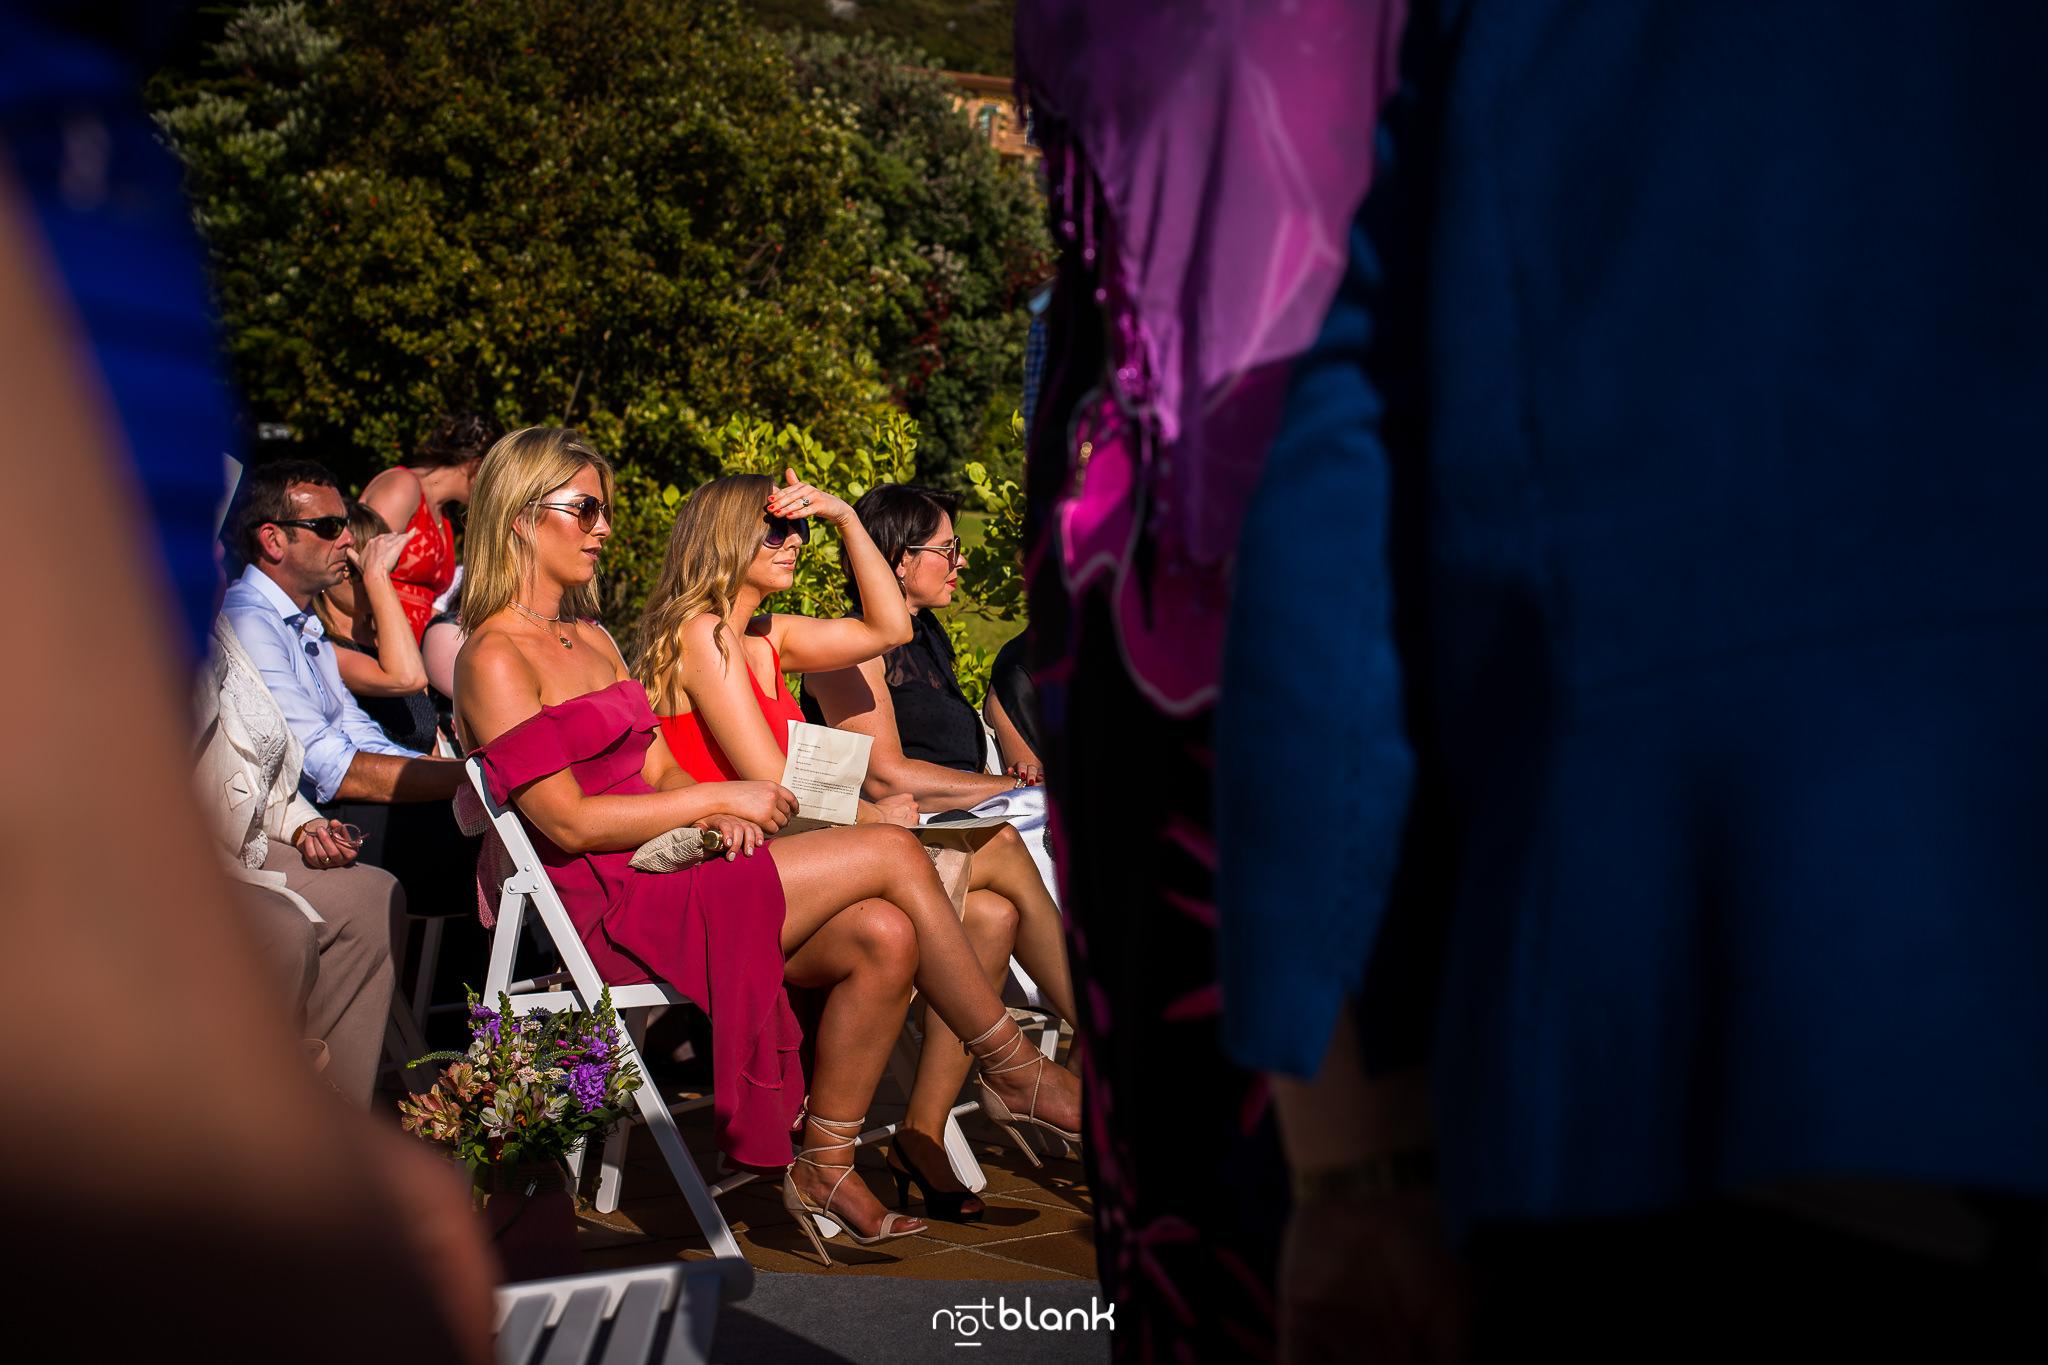 Boda-Maite-David-Invitadas-Con-Vestido-Rojo-En-Ceremonia-civil-Talaso-Atlantico. Reportaje realizado por Notblank fotógrafos de boda